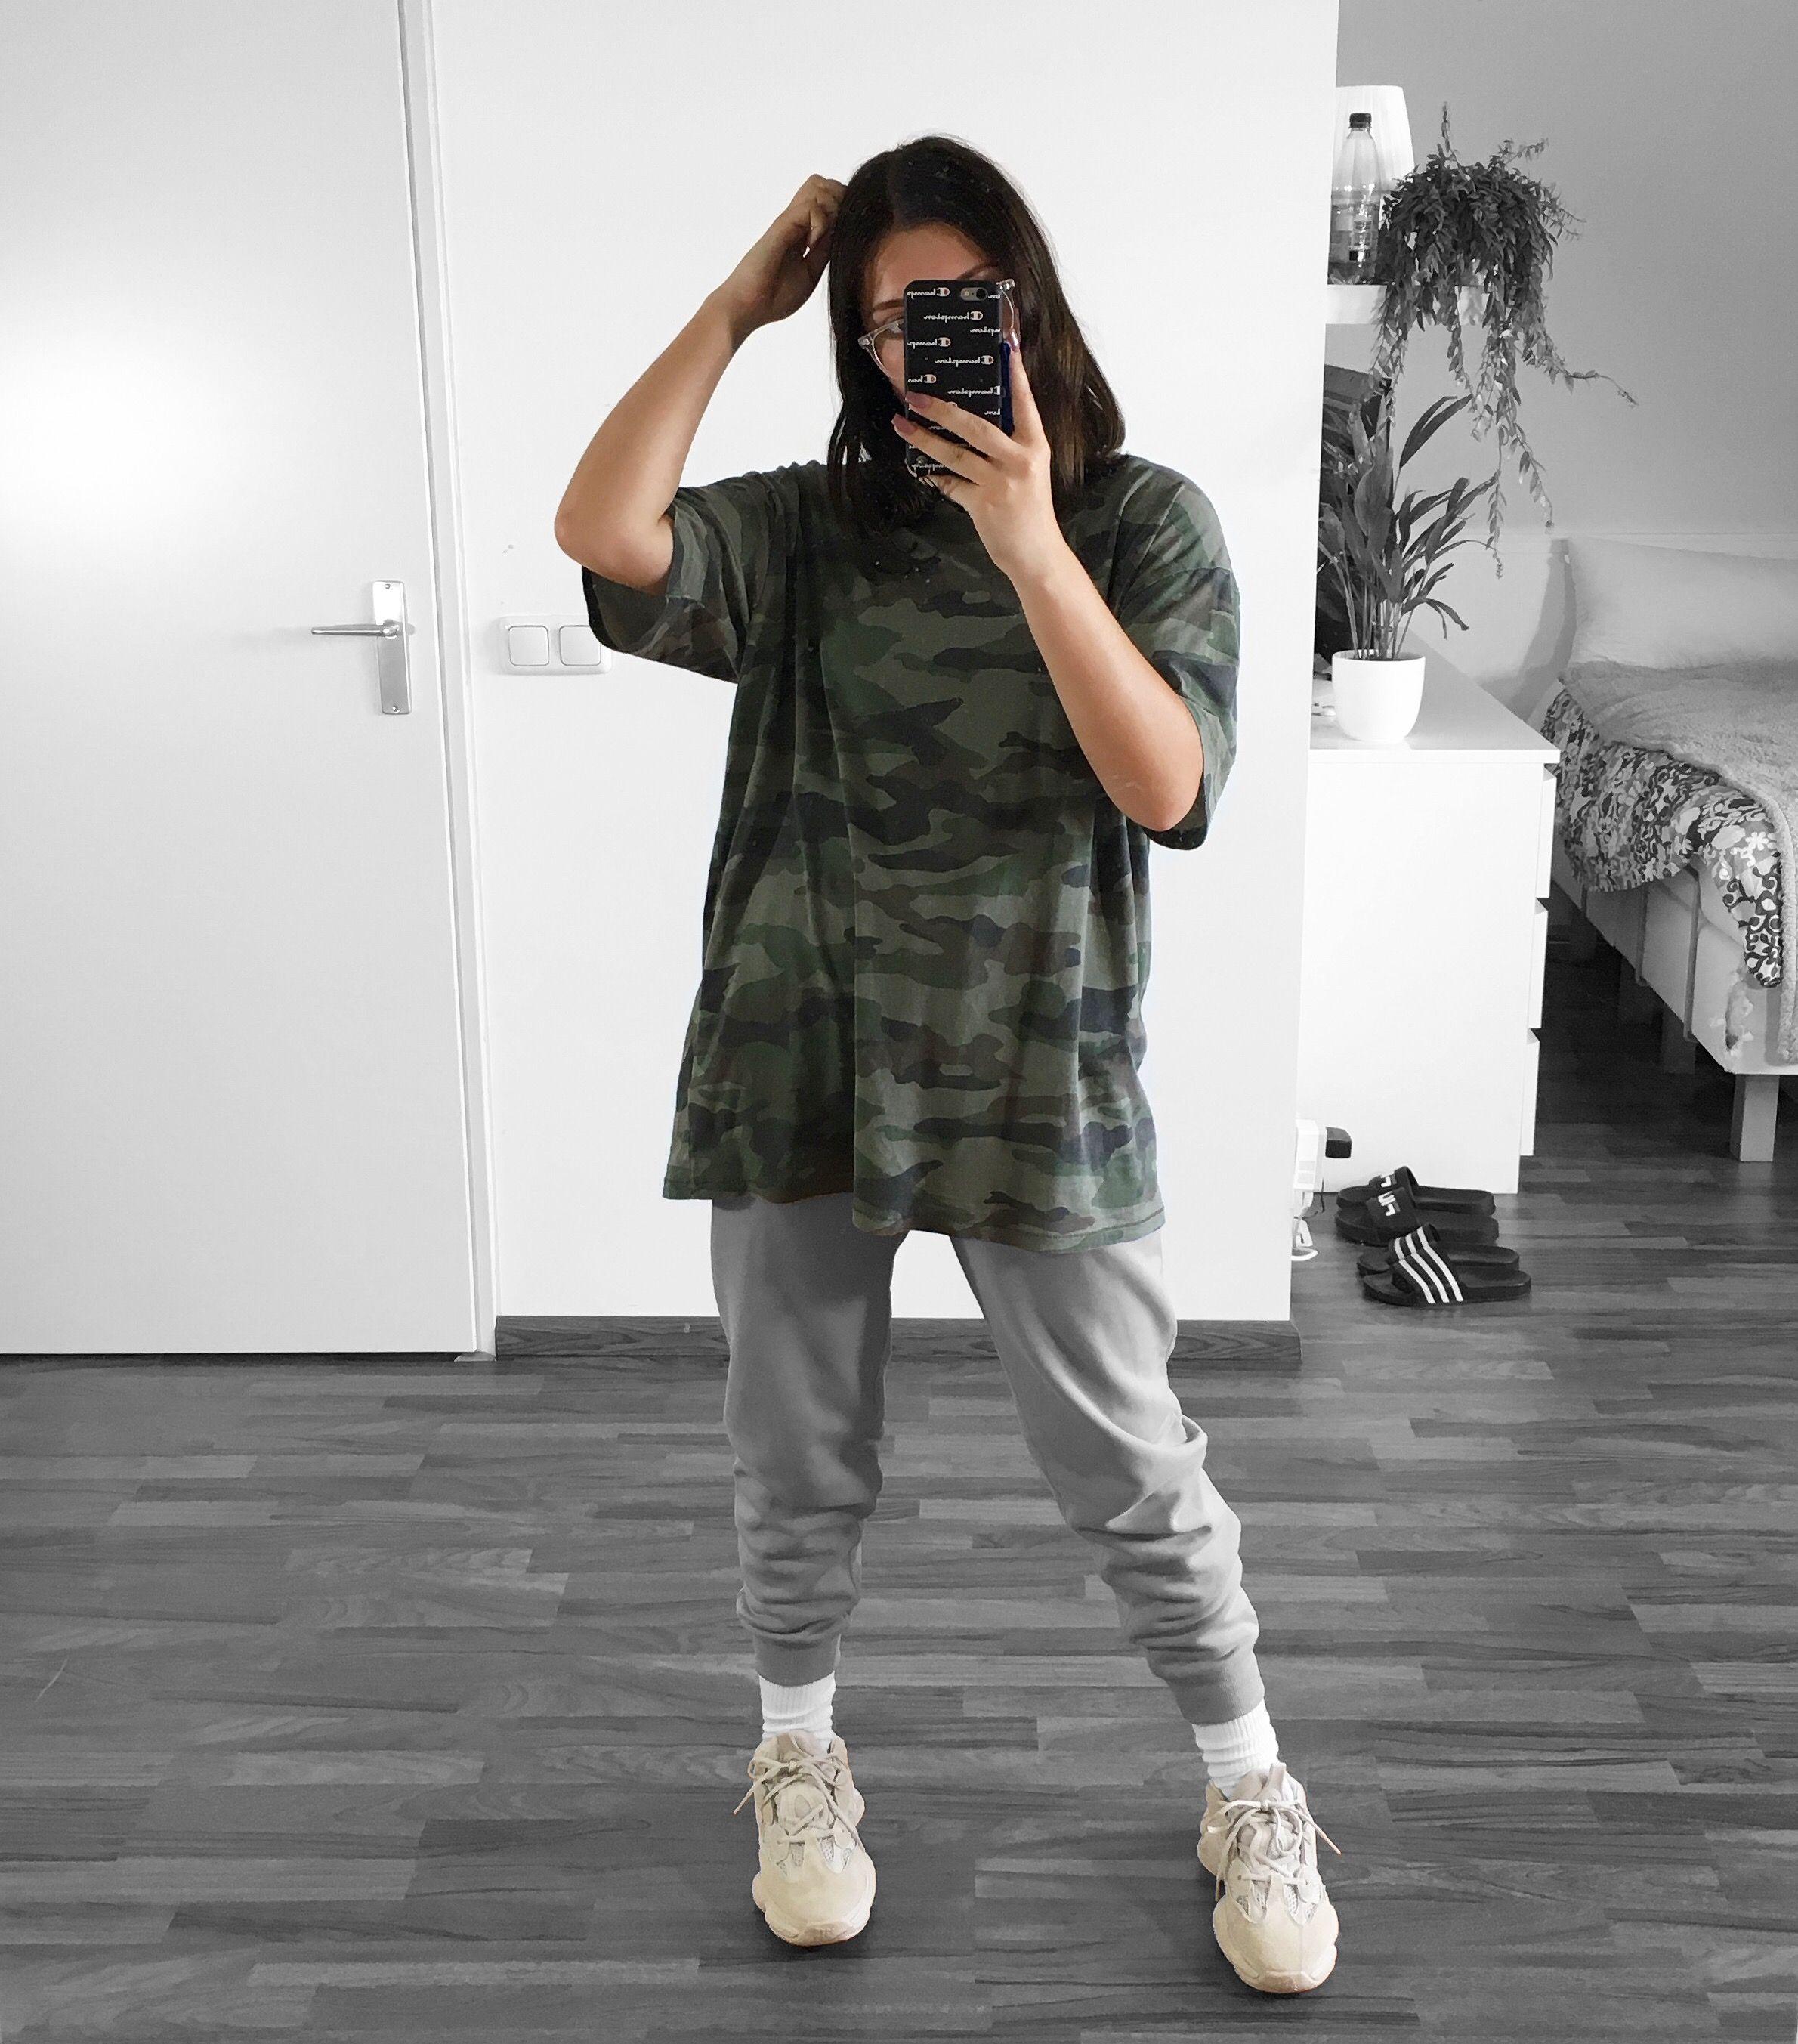 cf1f2c5b Yeezy 500 blush XX camouflage | Yeezys in 2019 | Outfits, Yeezy ...